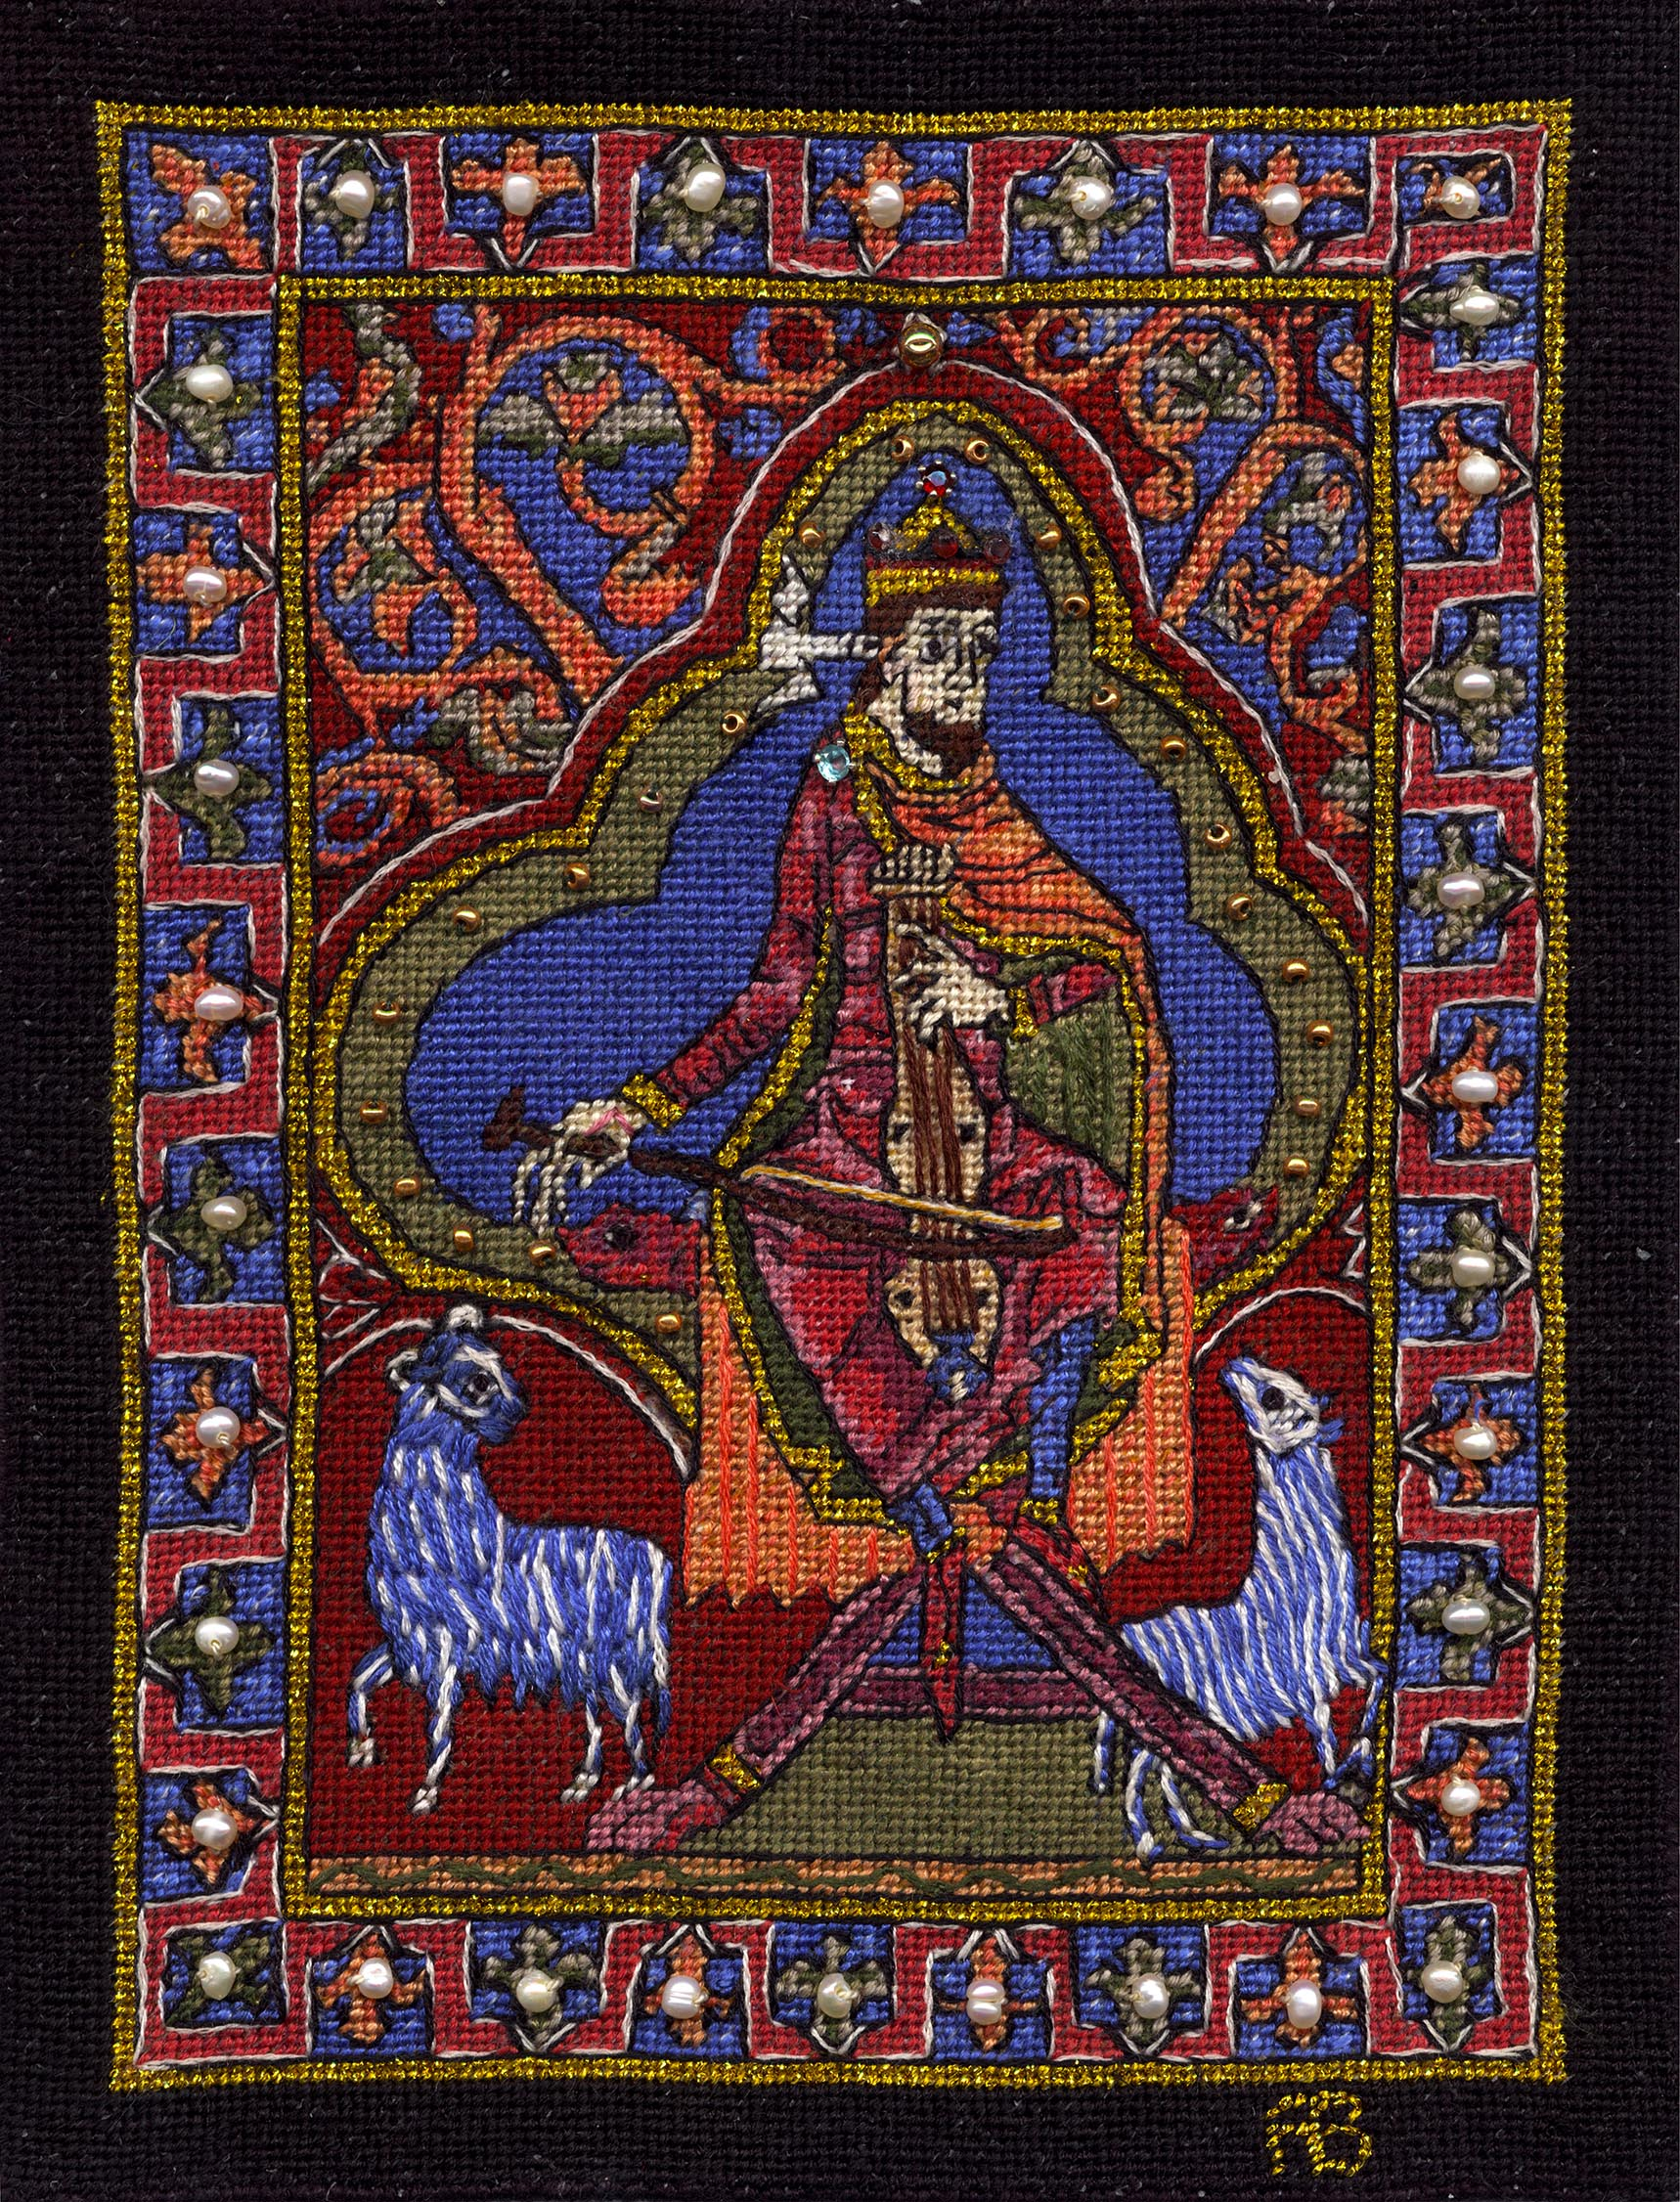 King David, Musician